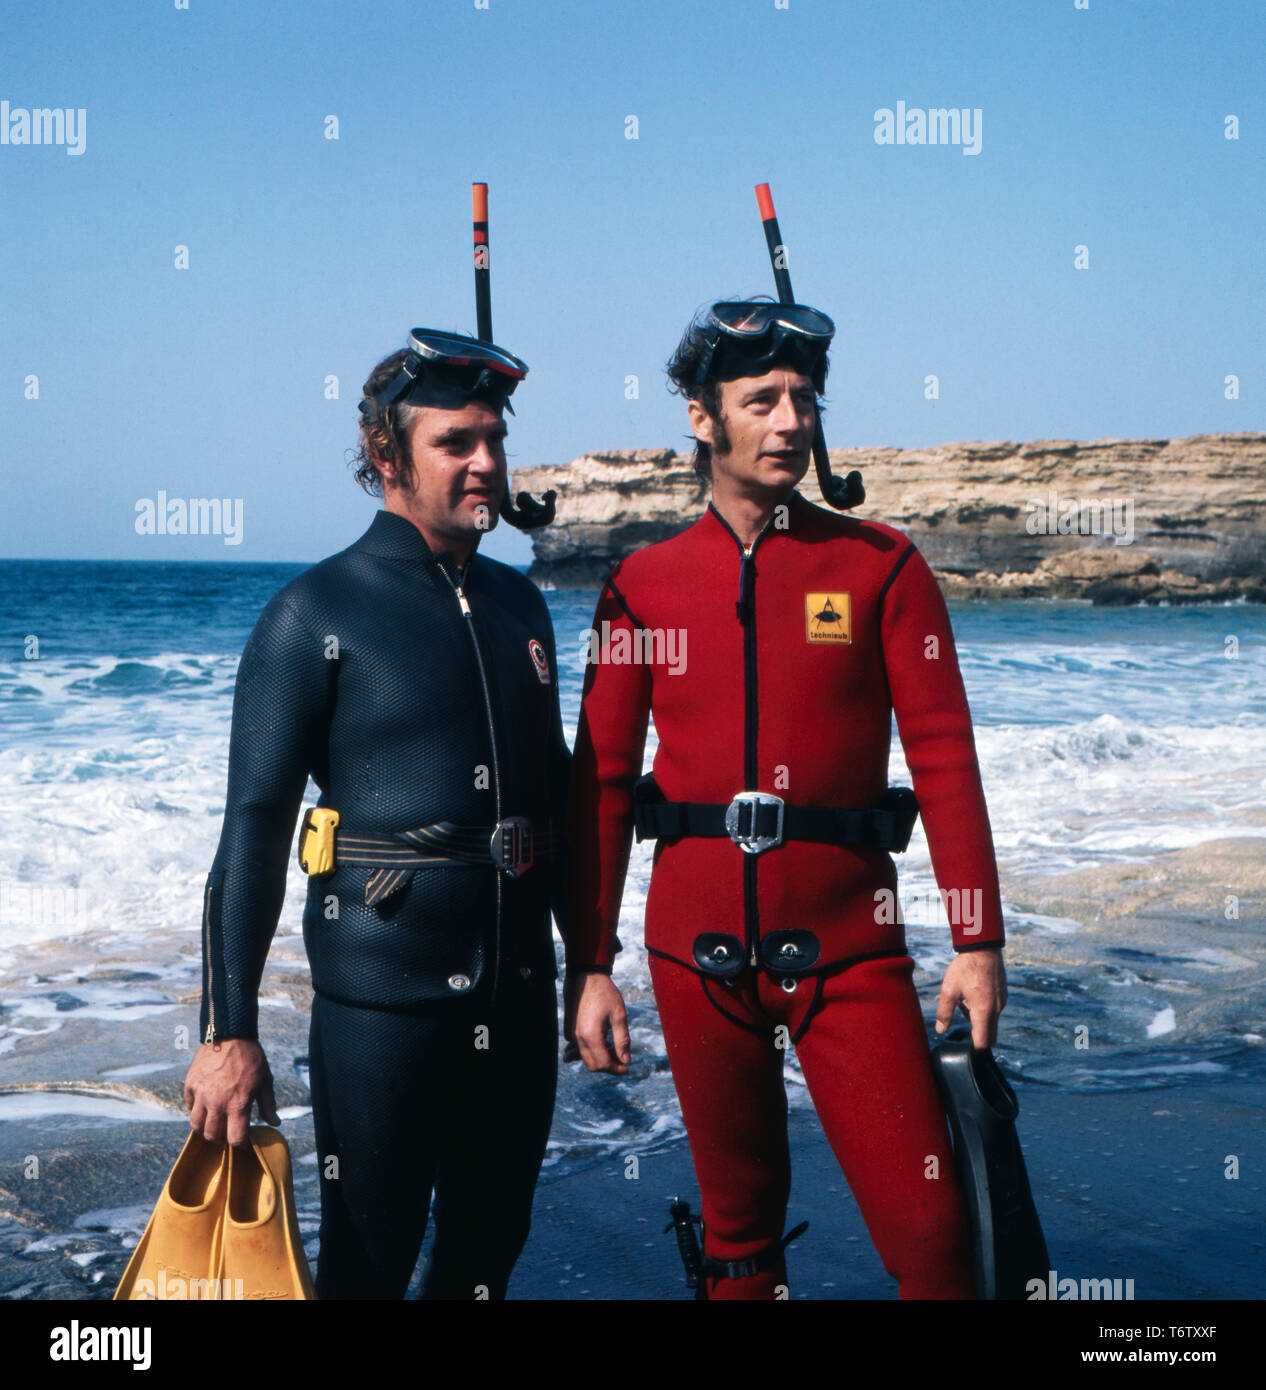 Muttermund Auf Mallorca: Mallorca 1970s Stock Photos & Mallorca 1970s Stock Images